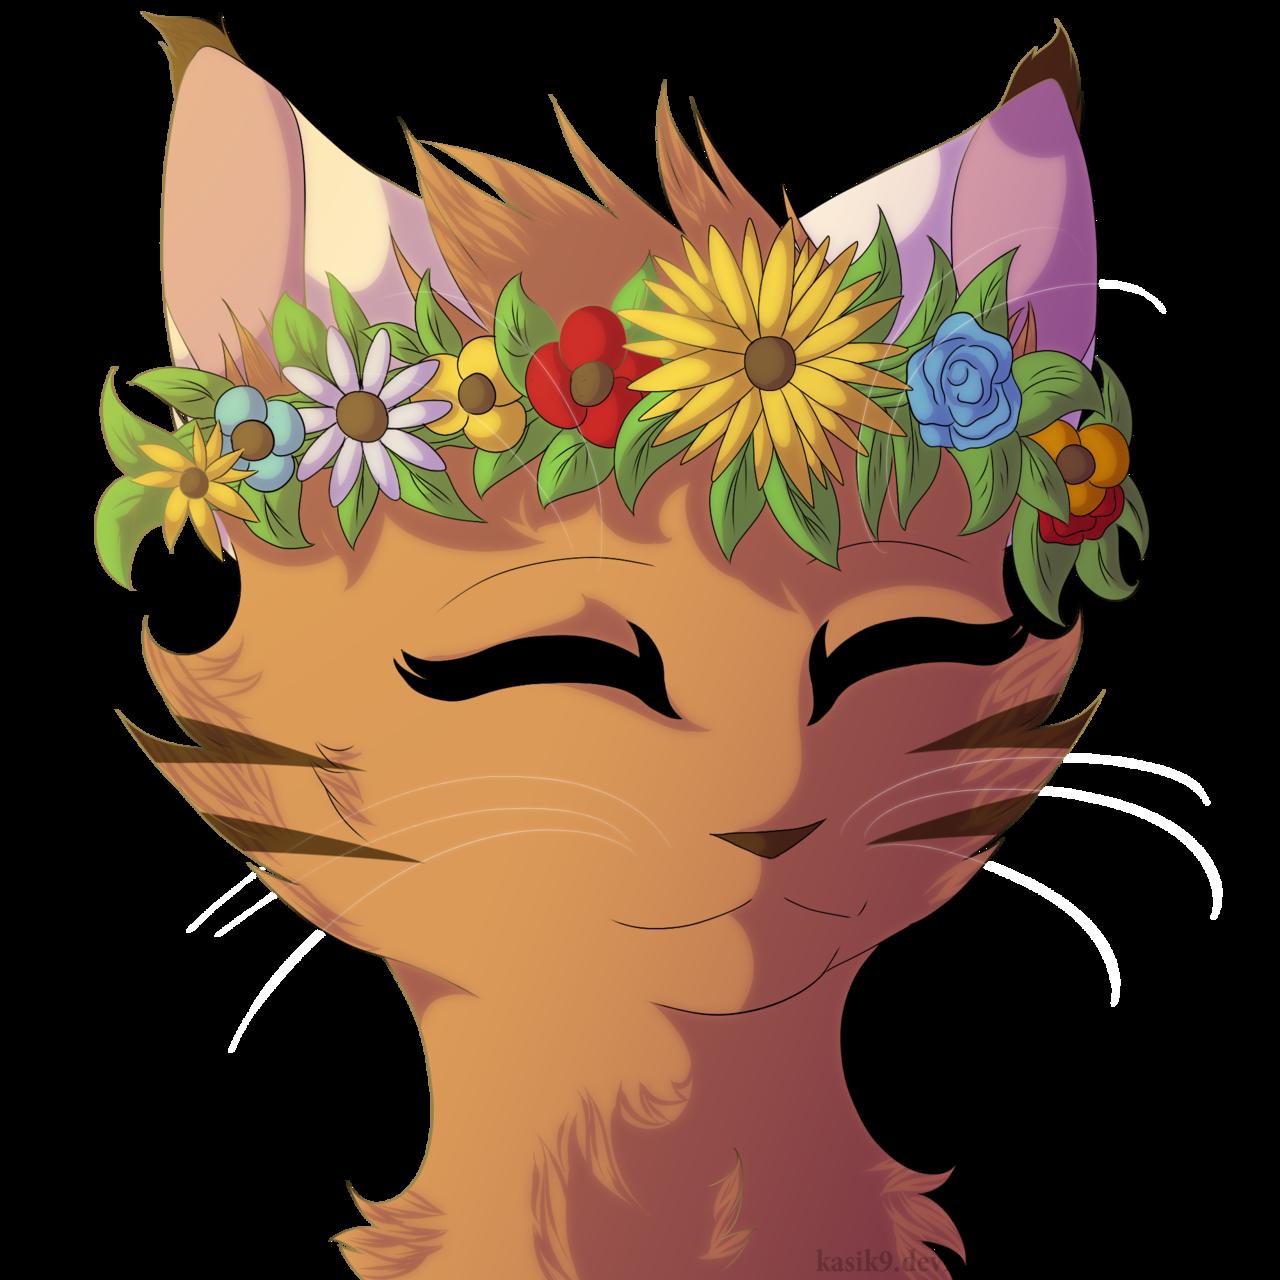 Image Flower Crowns Are Pretty By Kasik9 D8w38lbg Animal Jam